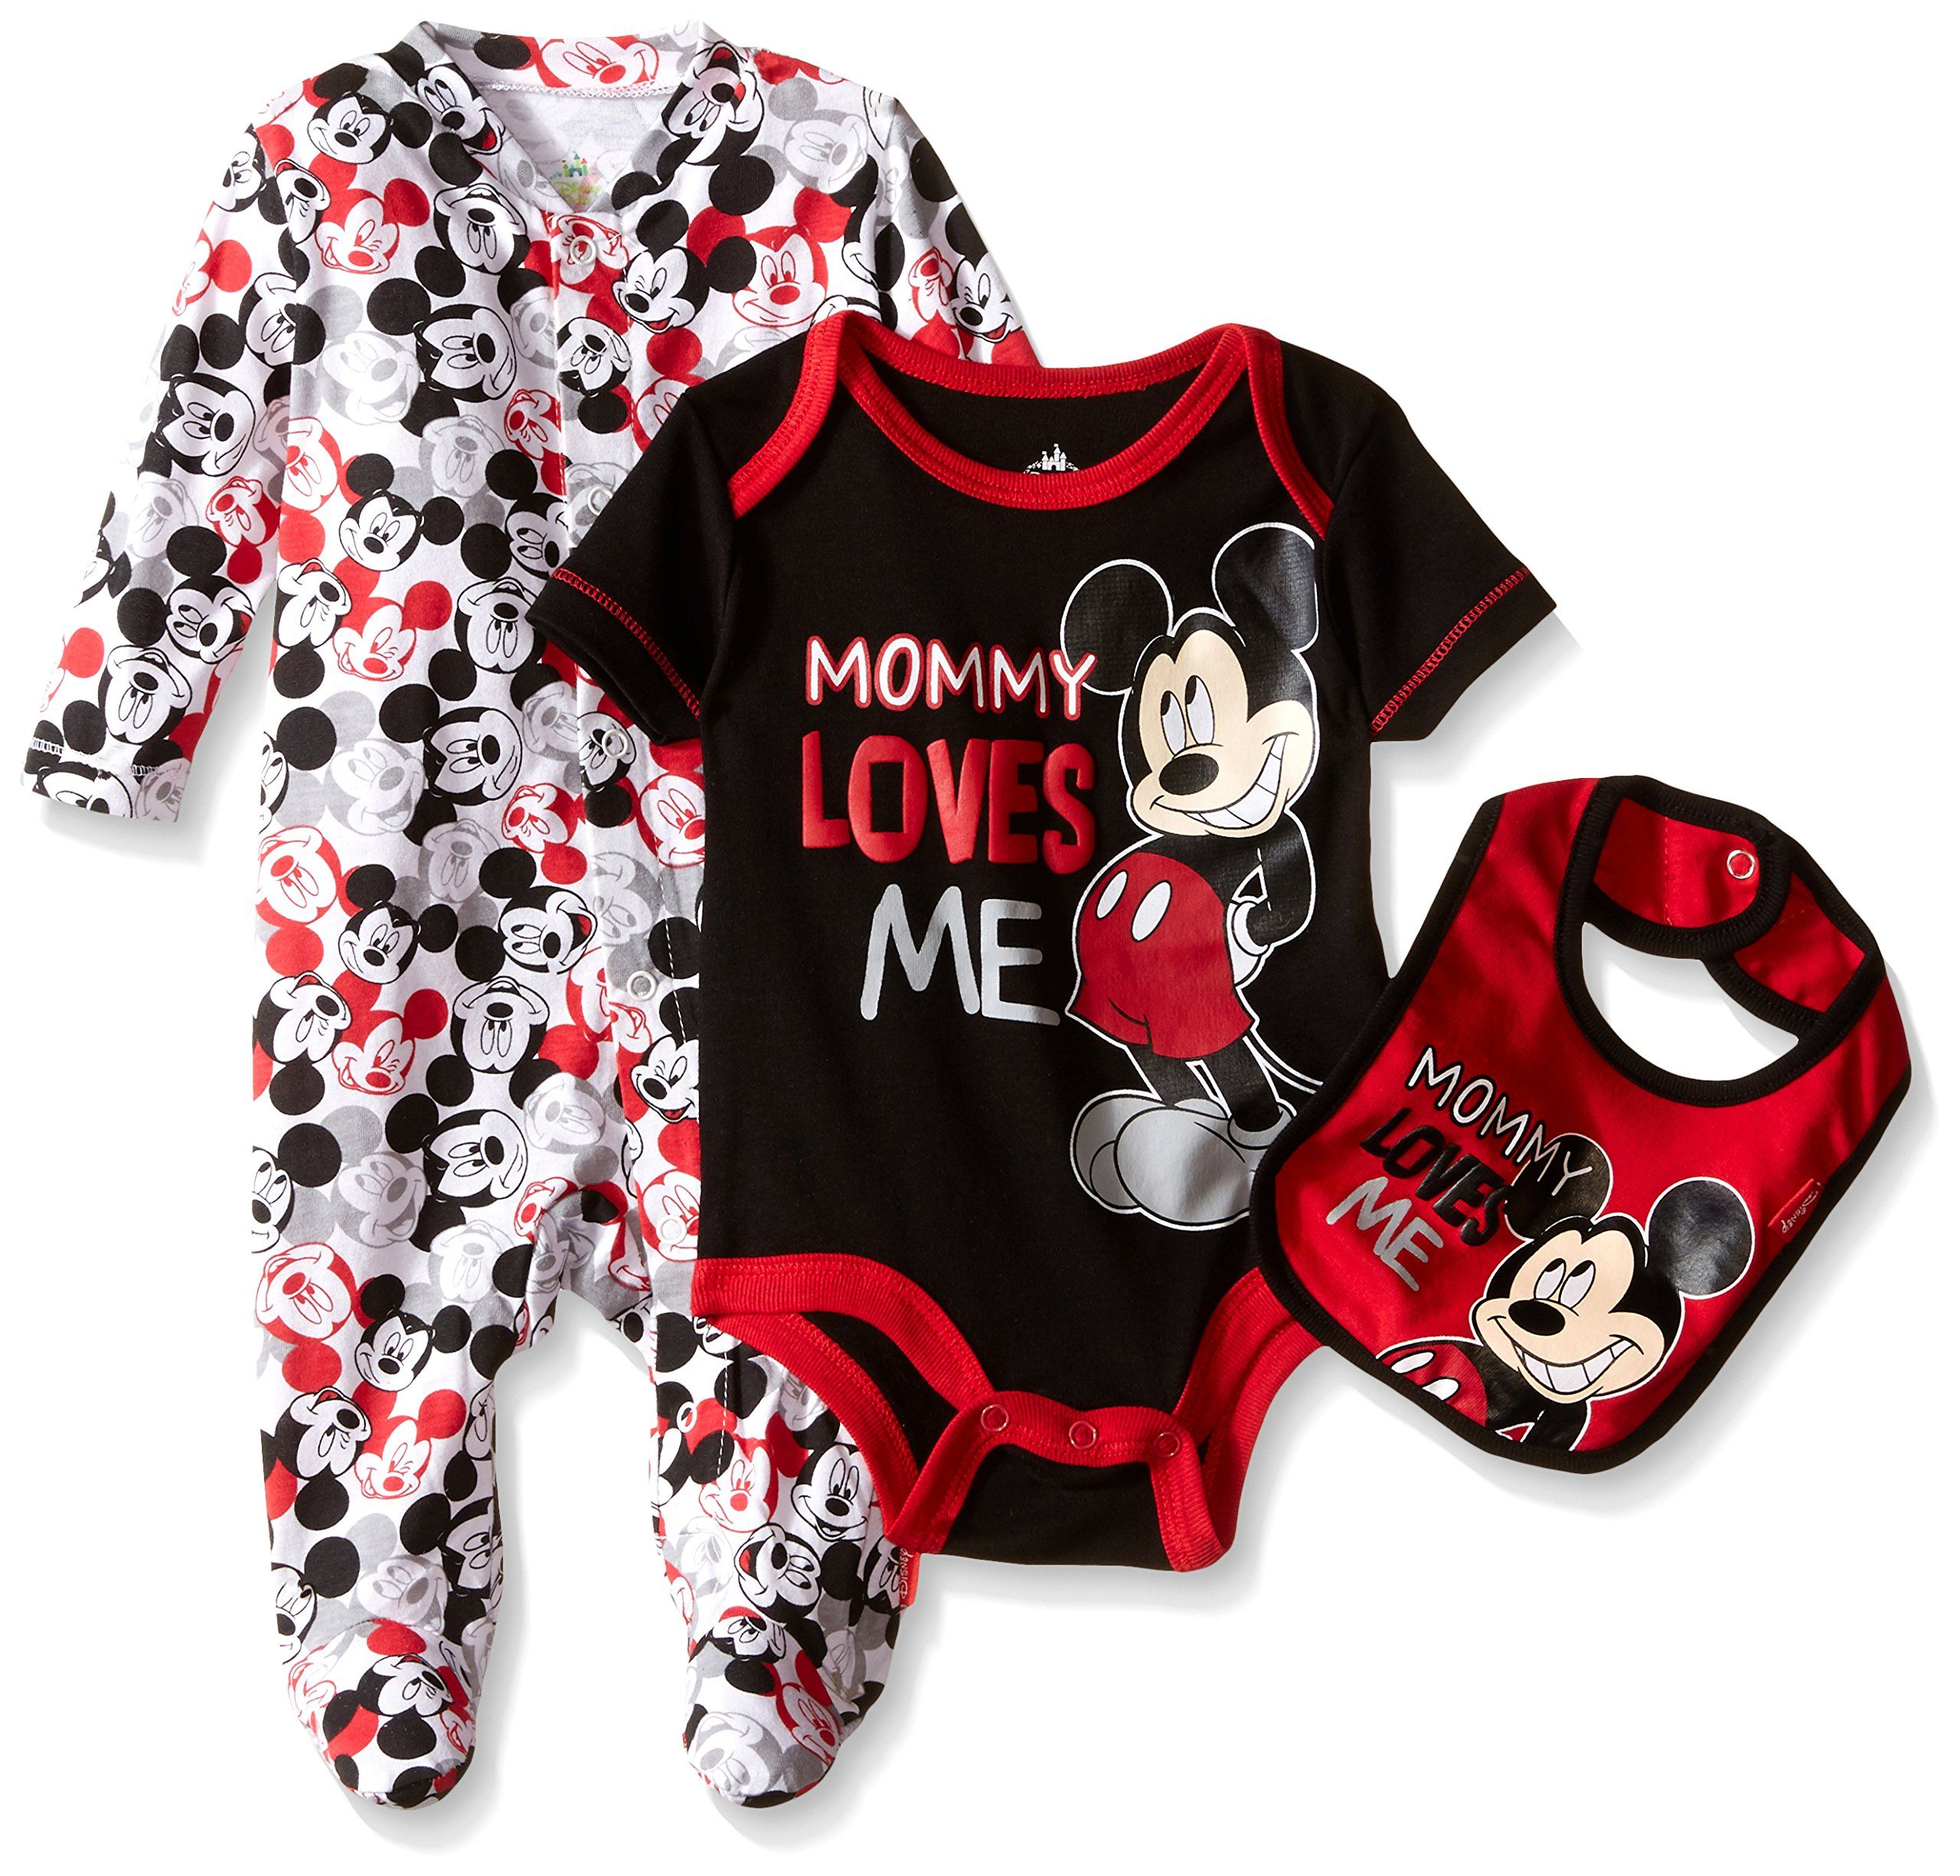 Disney Baby Mickey Mouse 3 Piece Layette Set Mickey Black